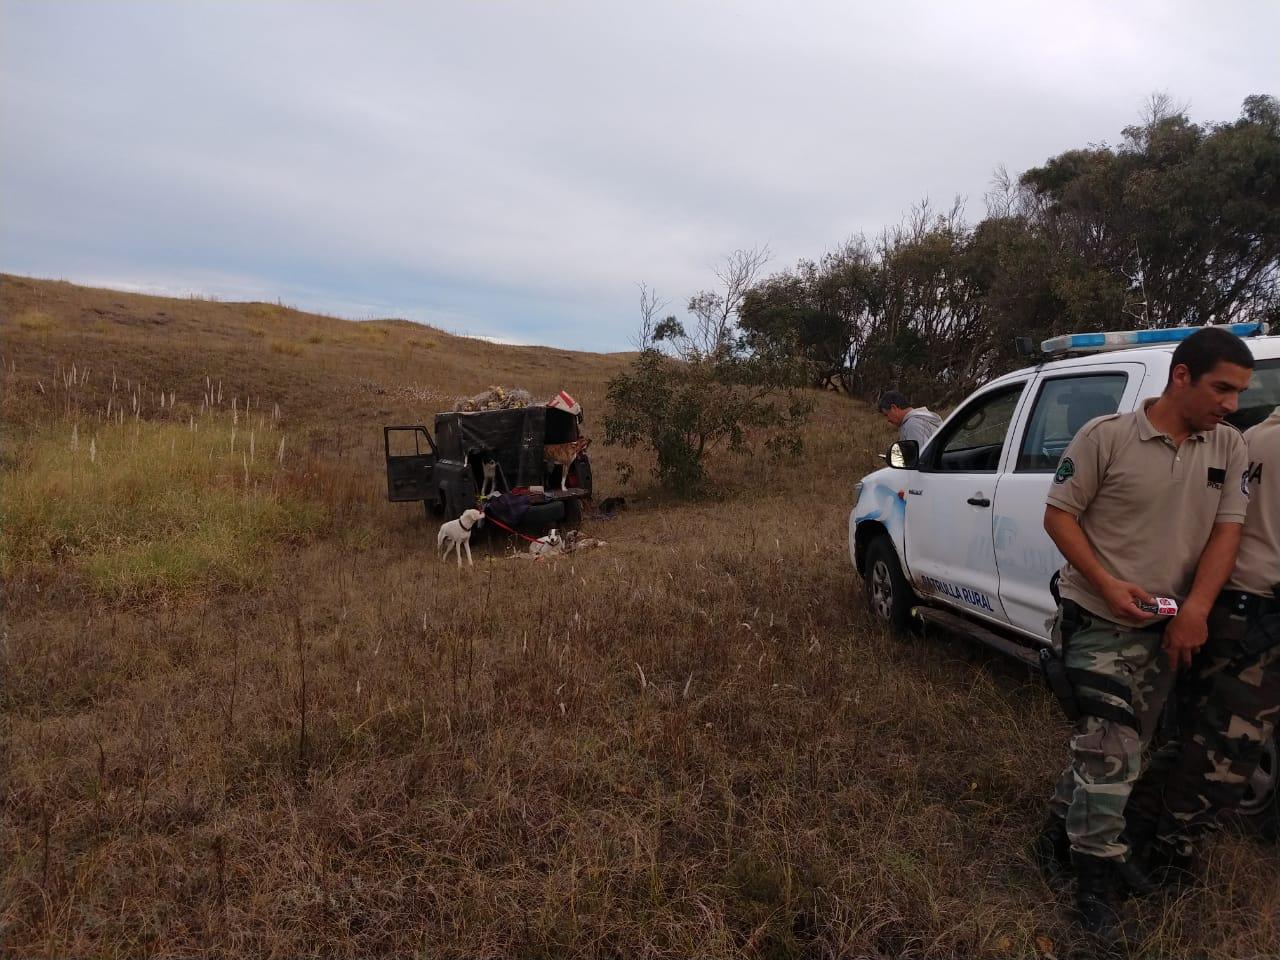 RESERVA NATURAL: Seis horas de persecución y tres cazadores furtivos demorados